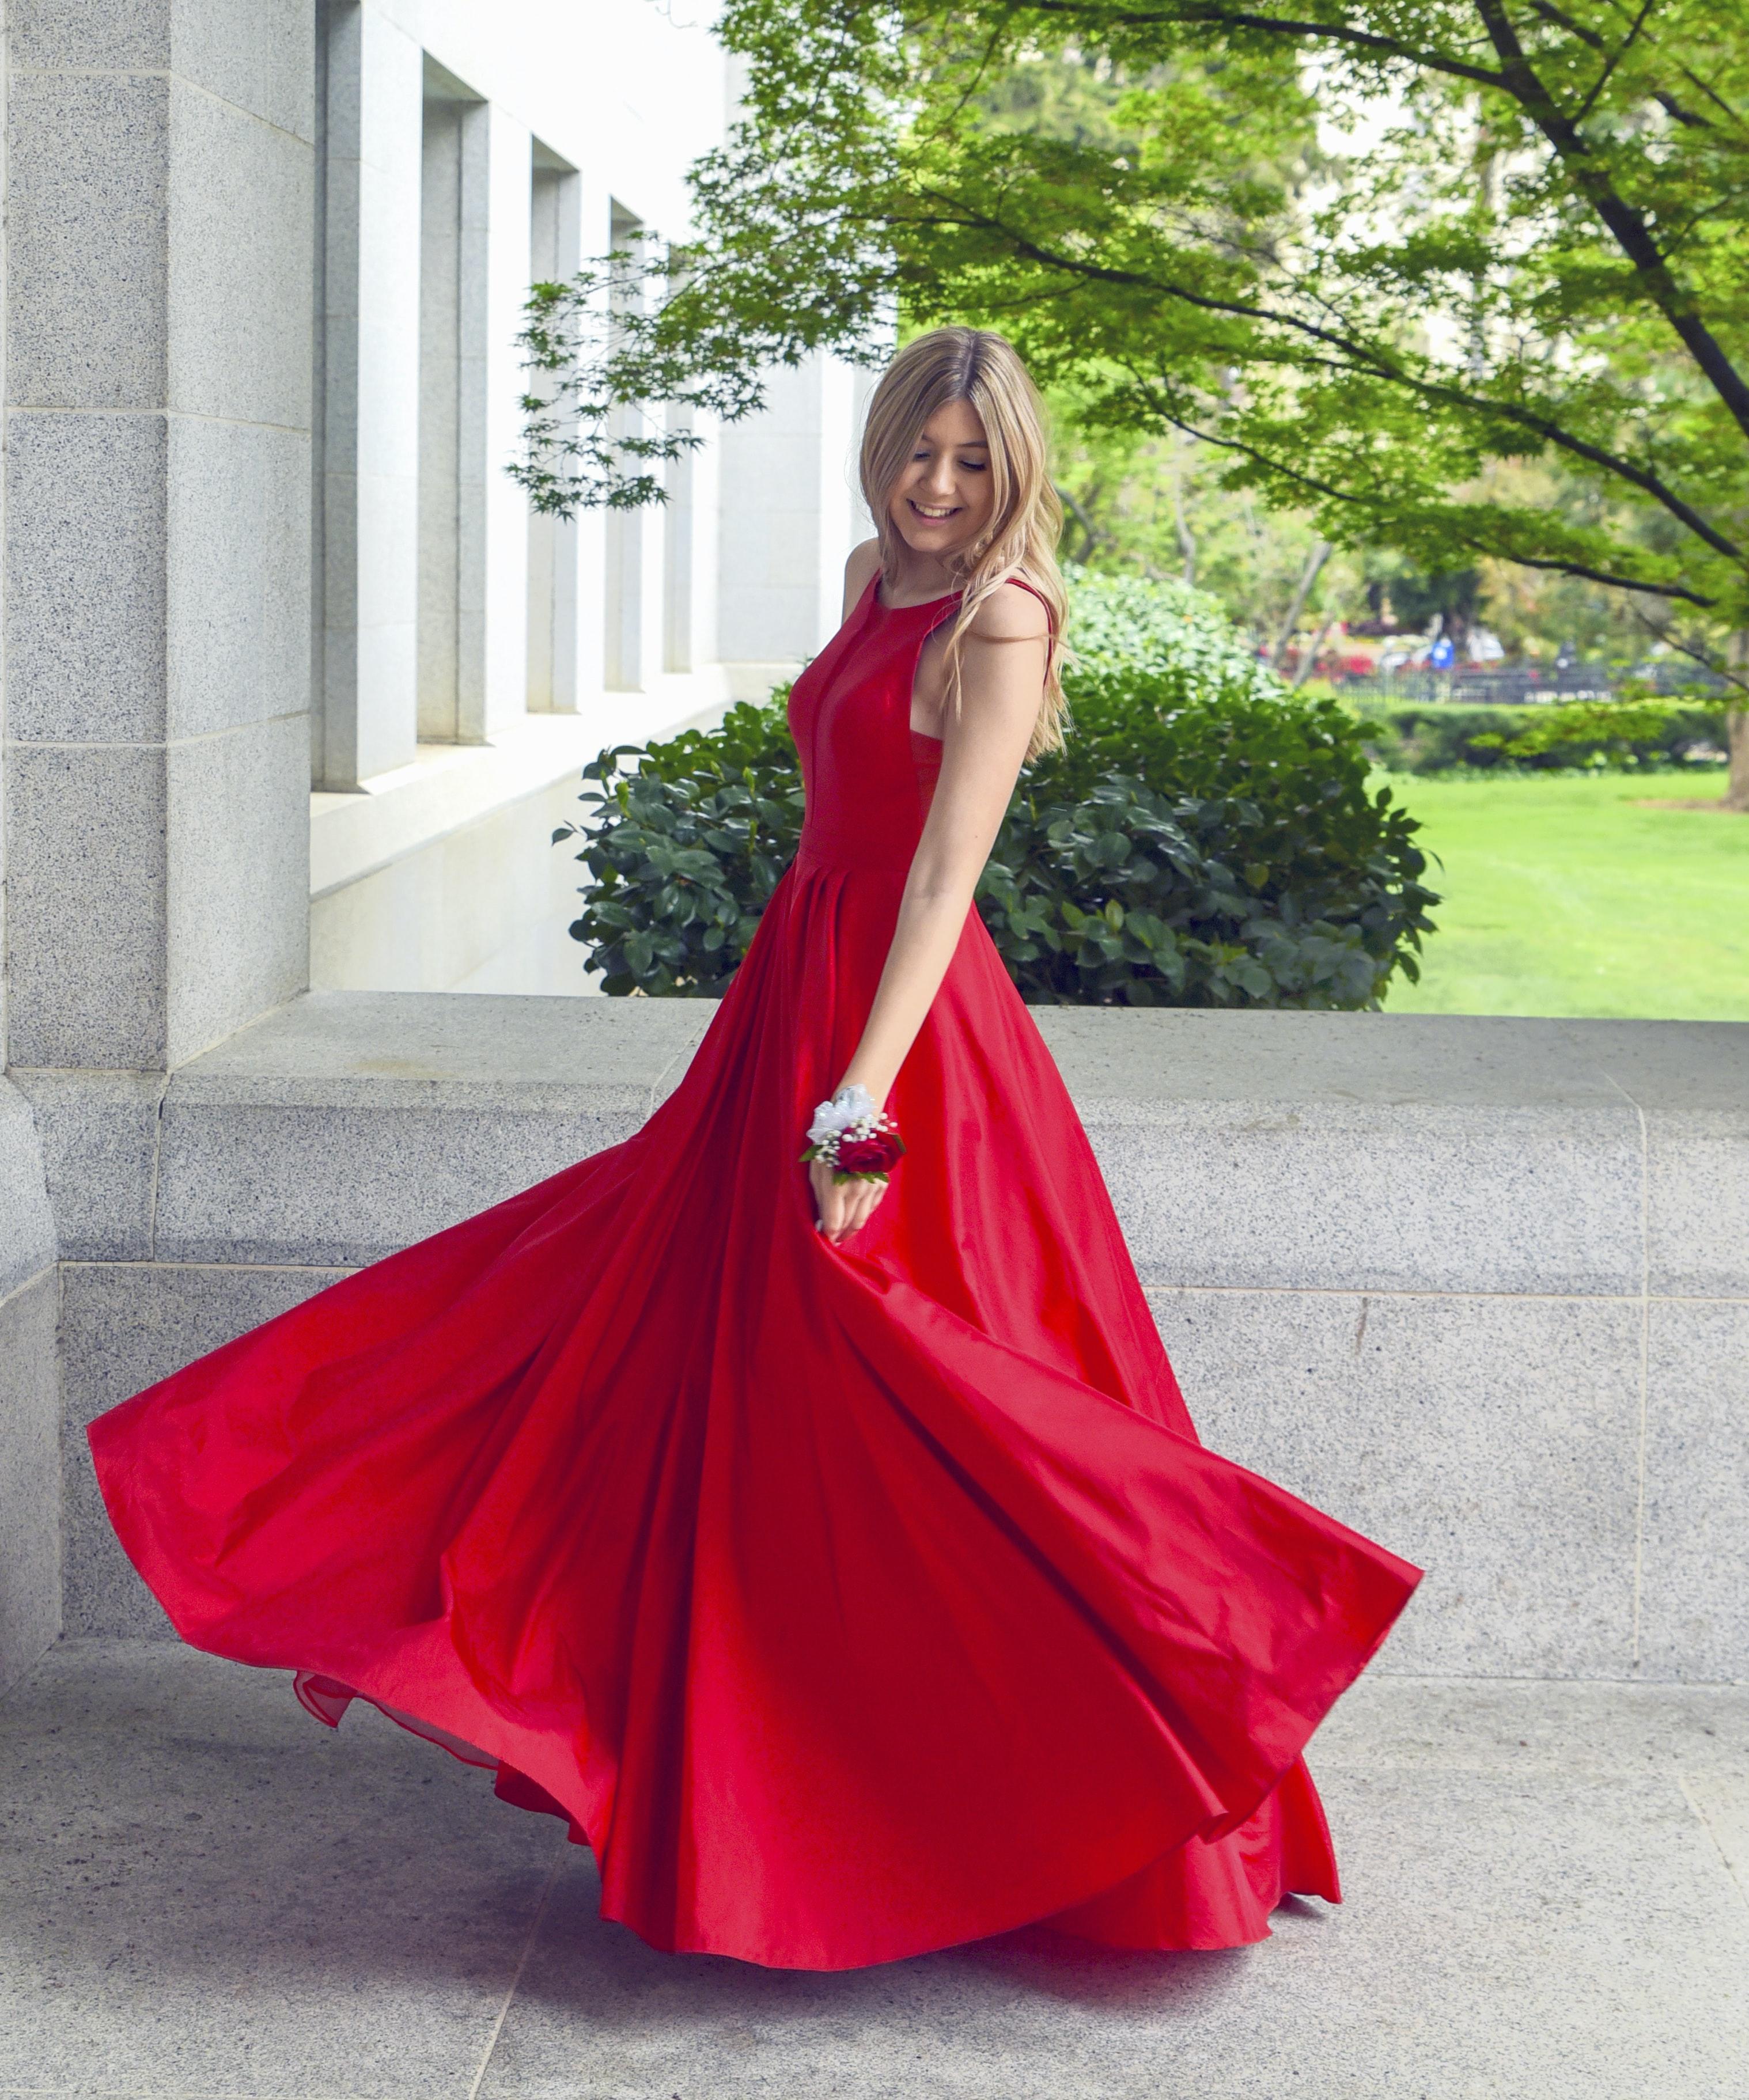 500+ Dress Pictures | Download Free Images on Unsplash